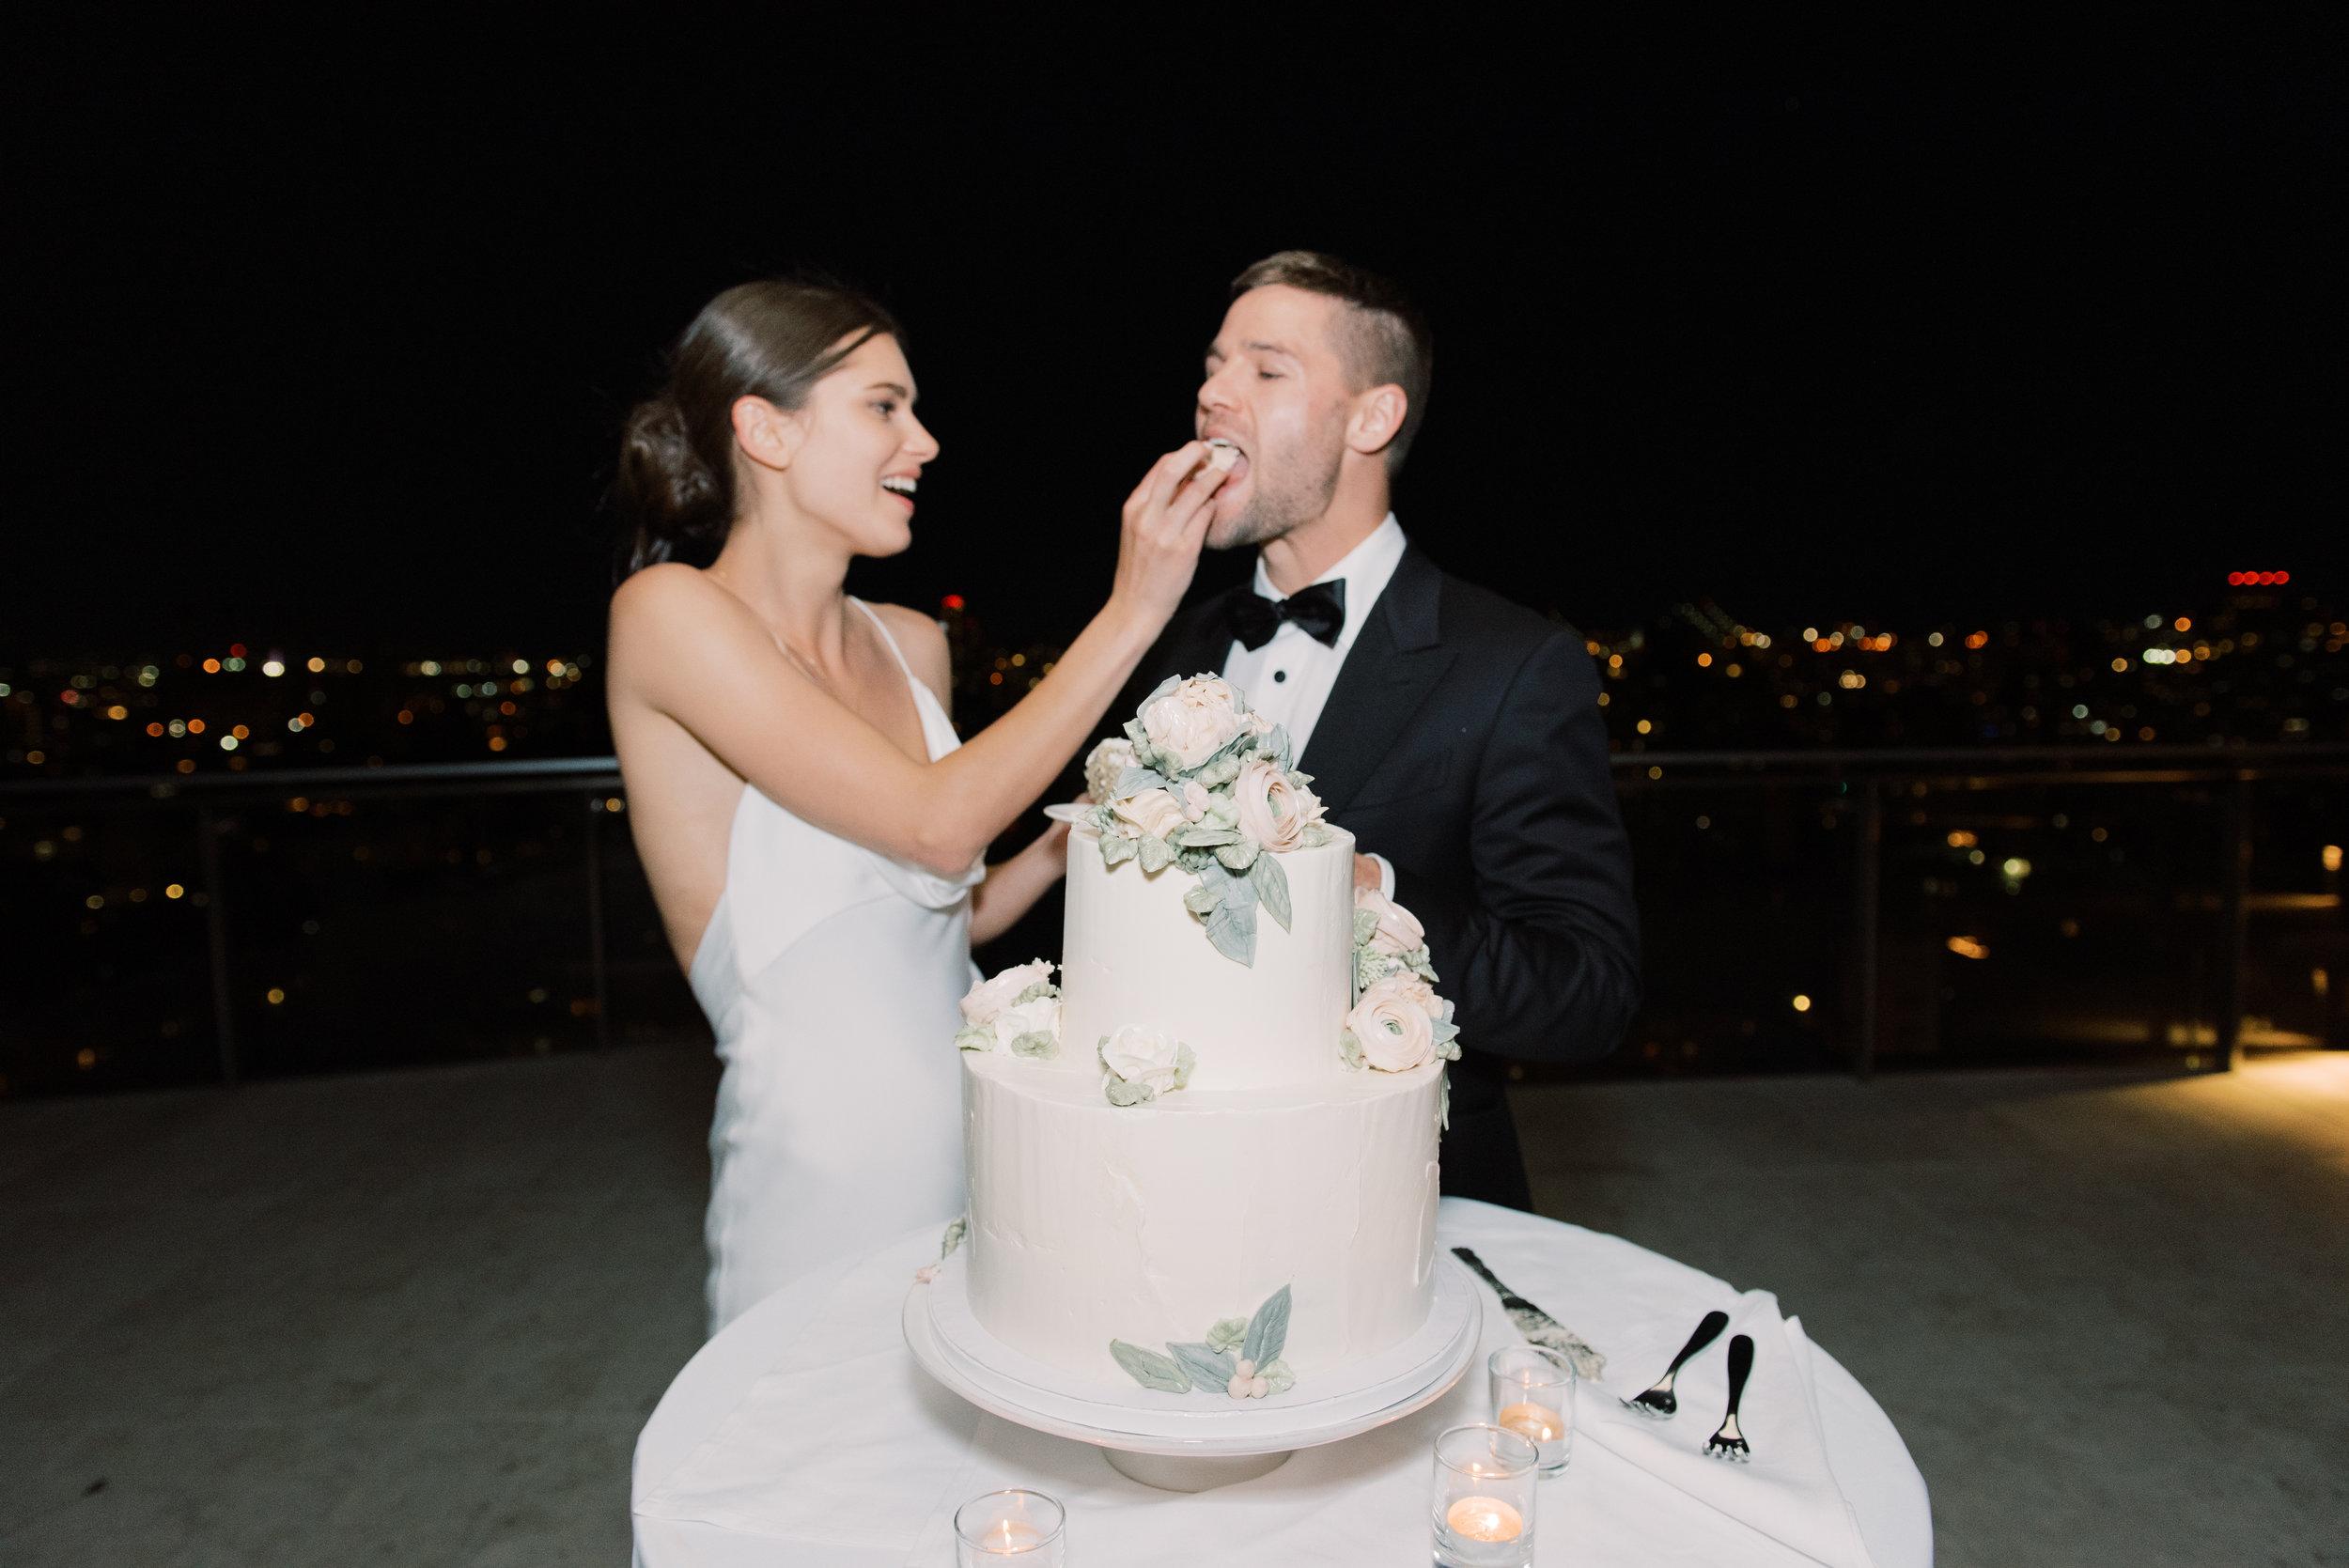 - Brooklyn Delight Wedding Specialphoto by Williamsburg Photo Studios